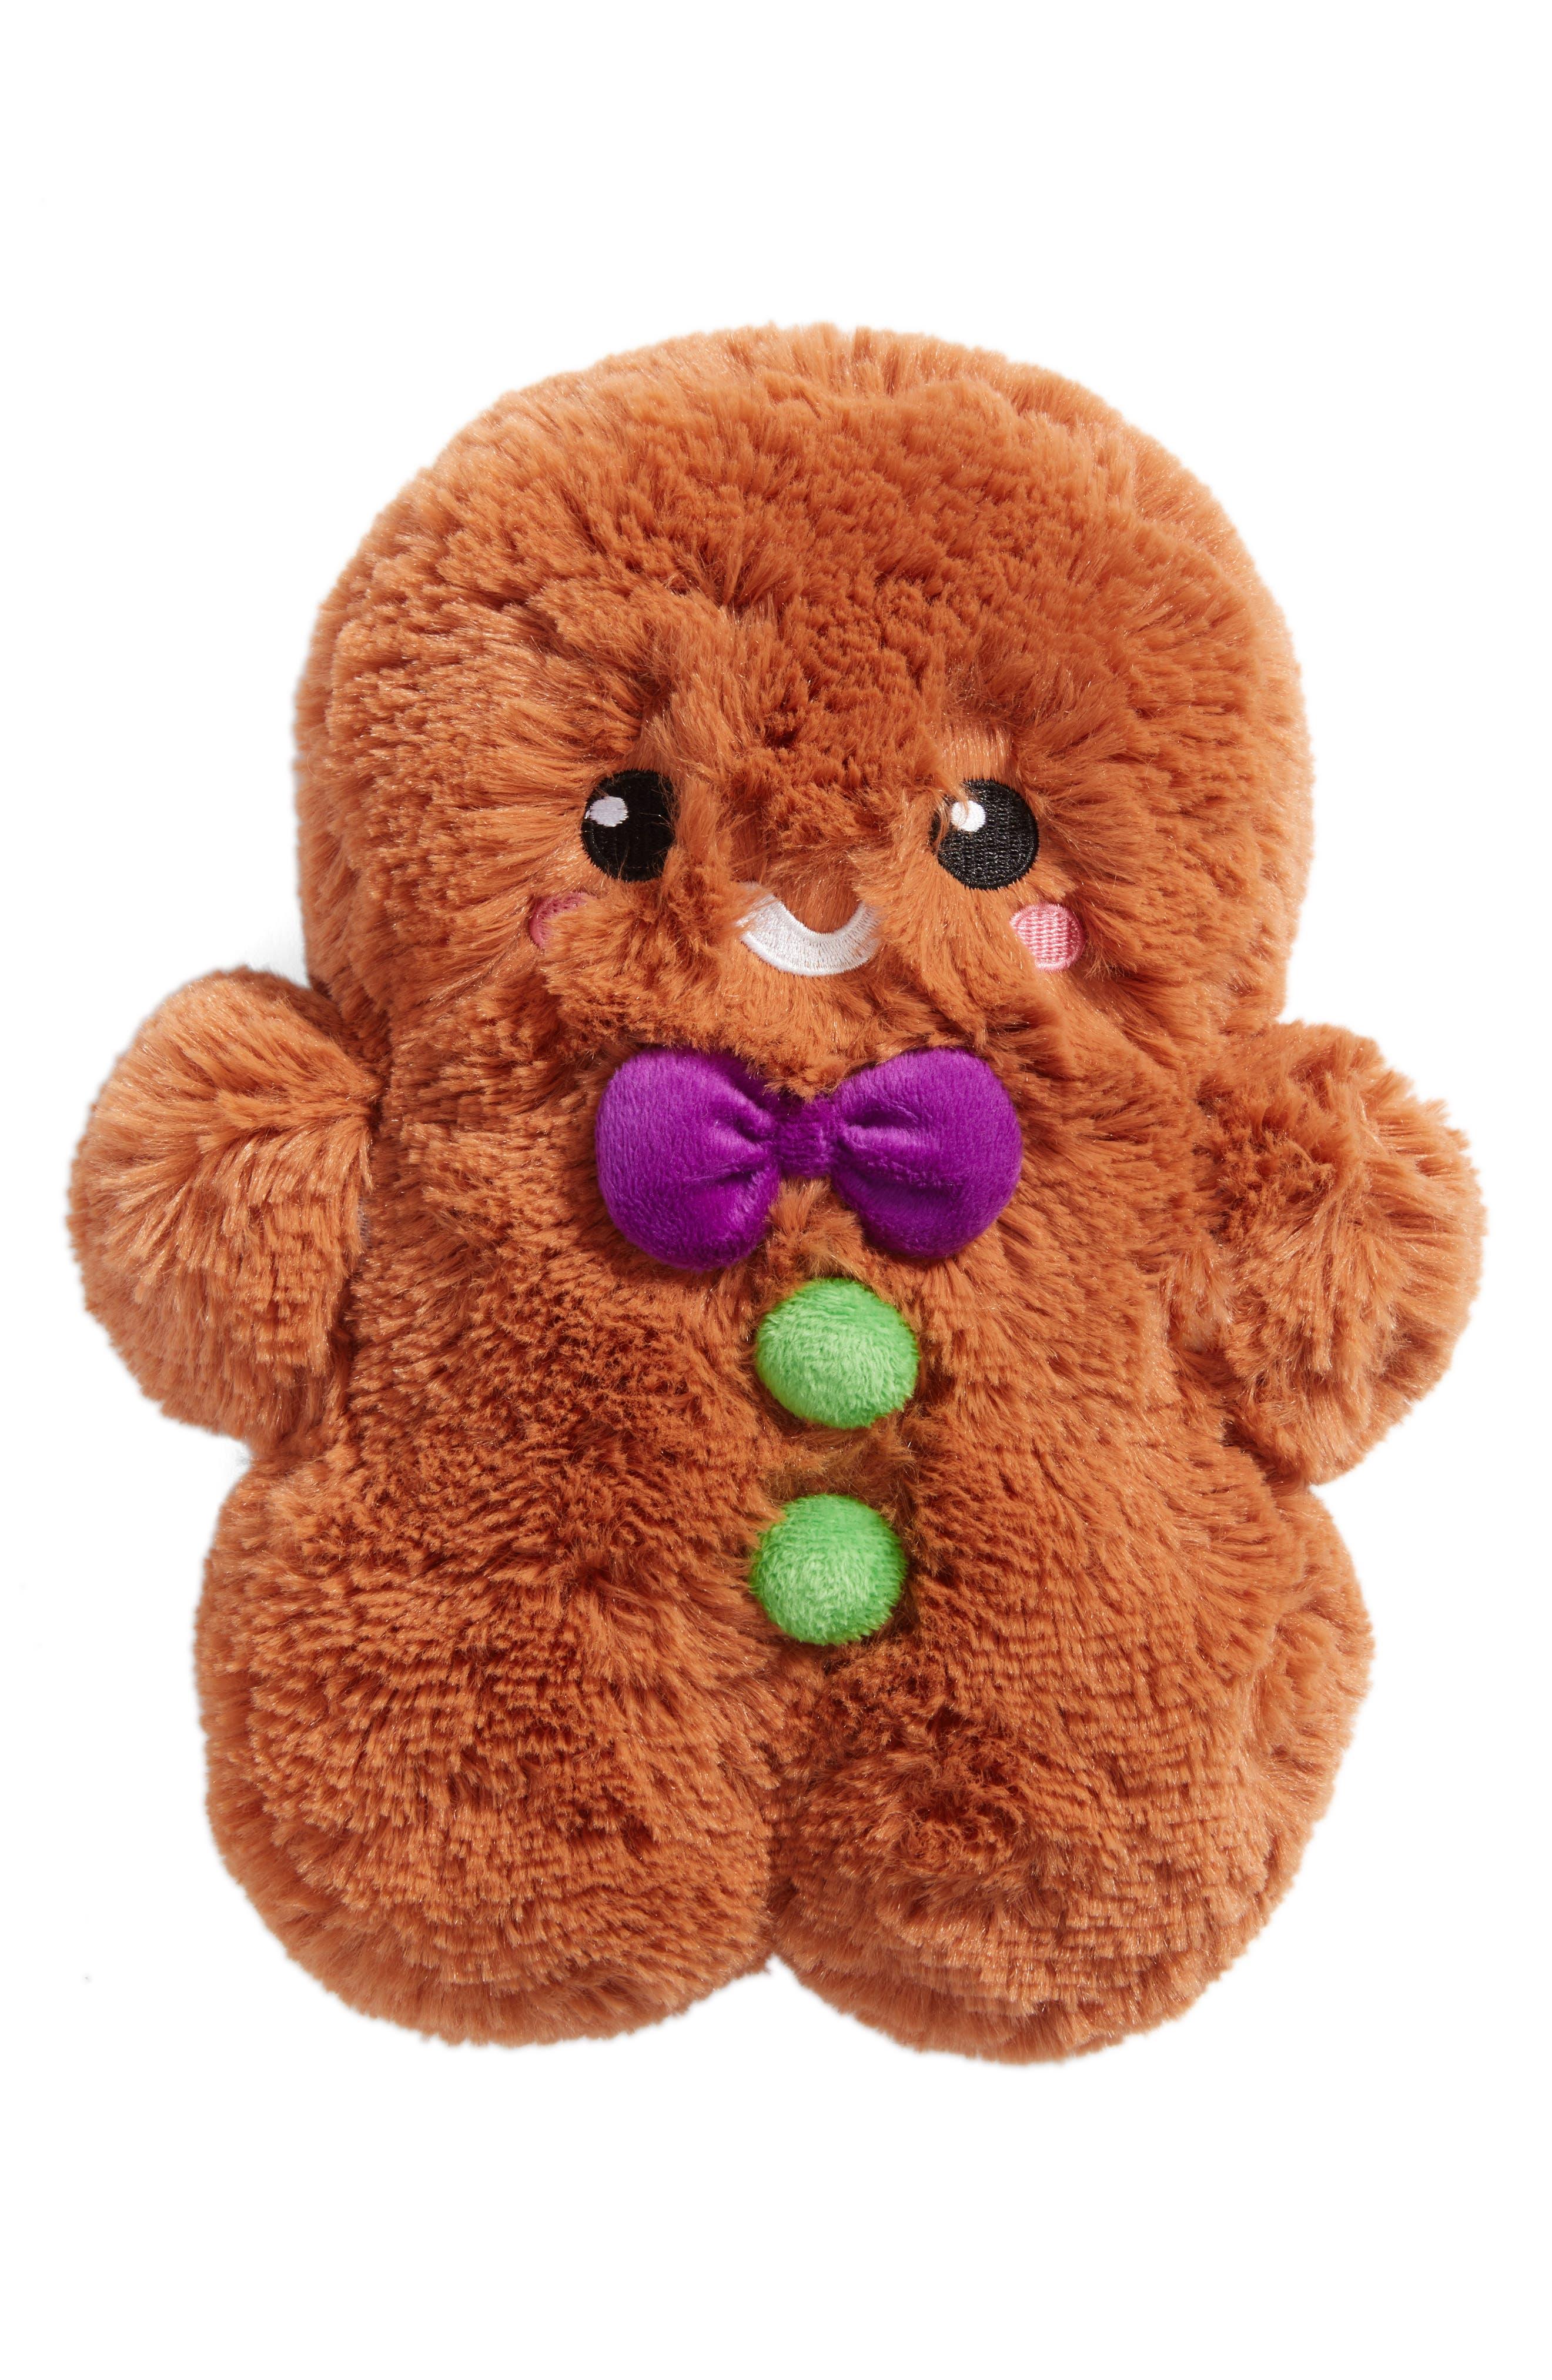 Squishable Mini Gingerbread Man Stuffed Toy